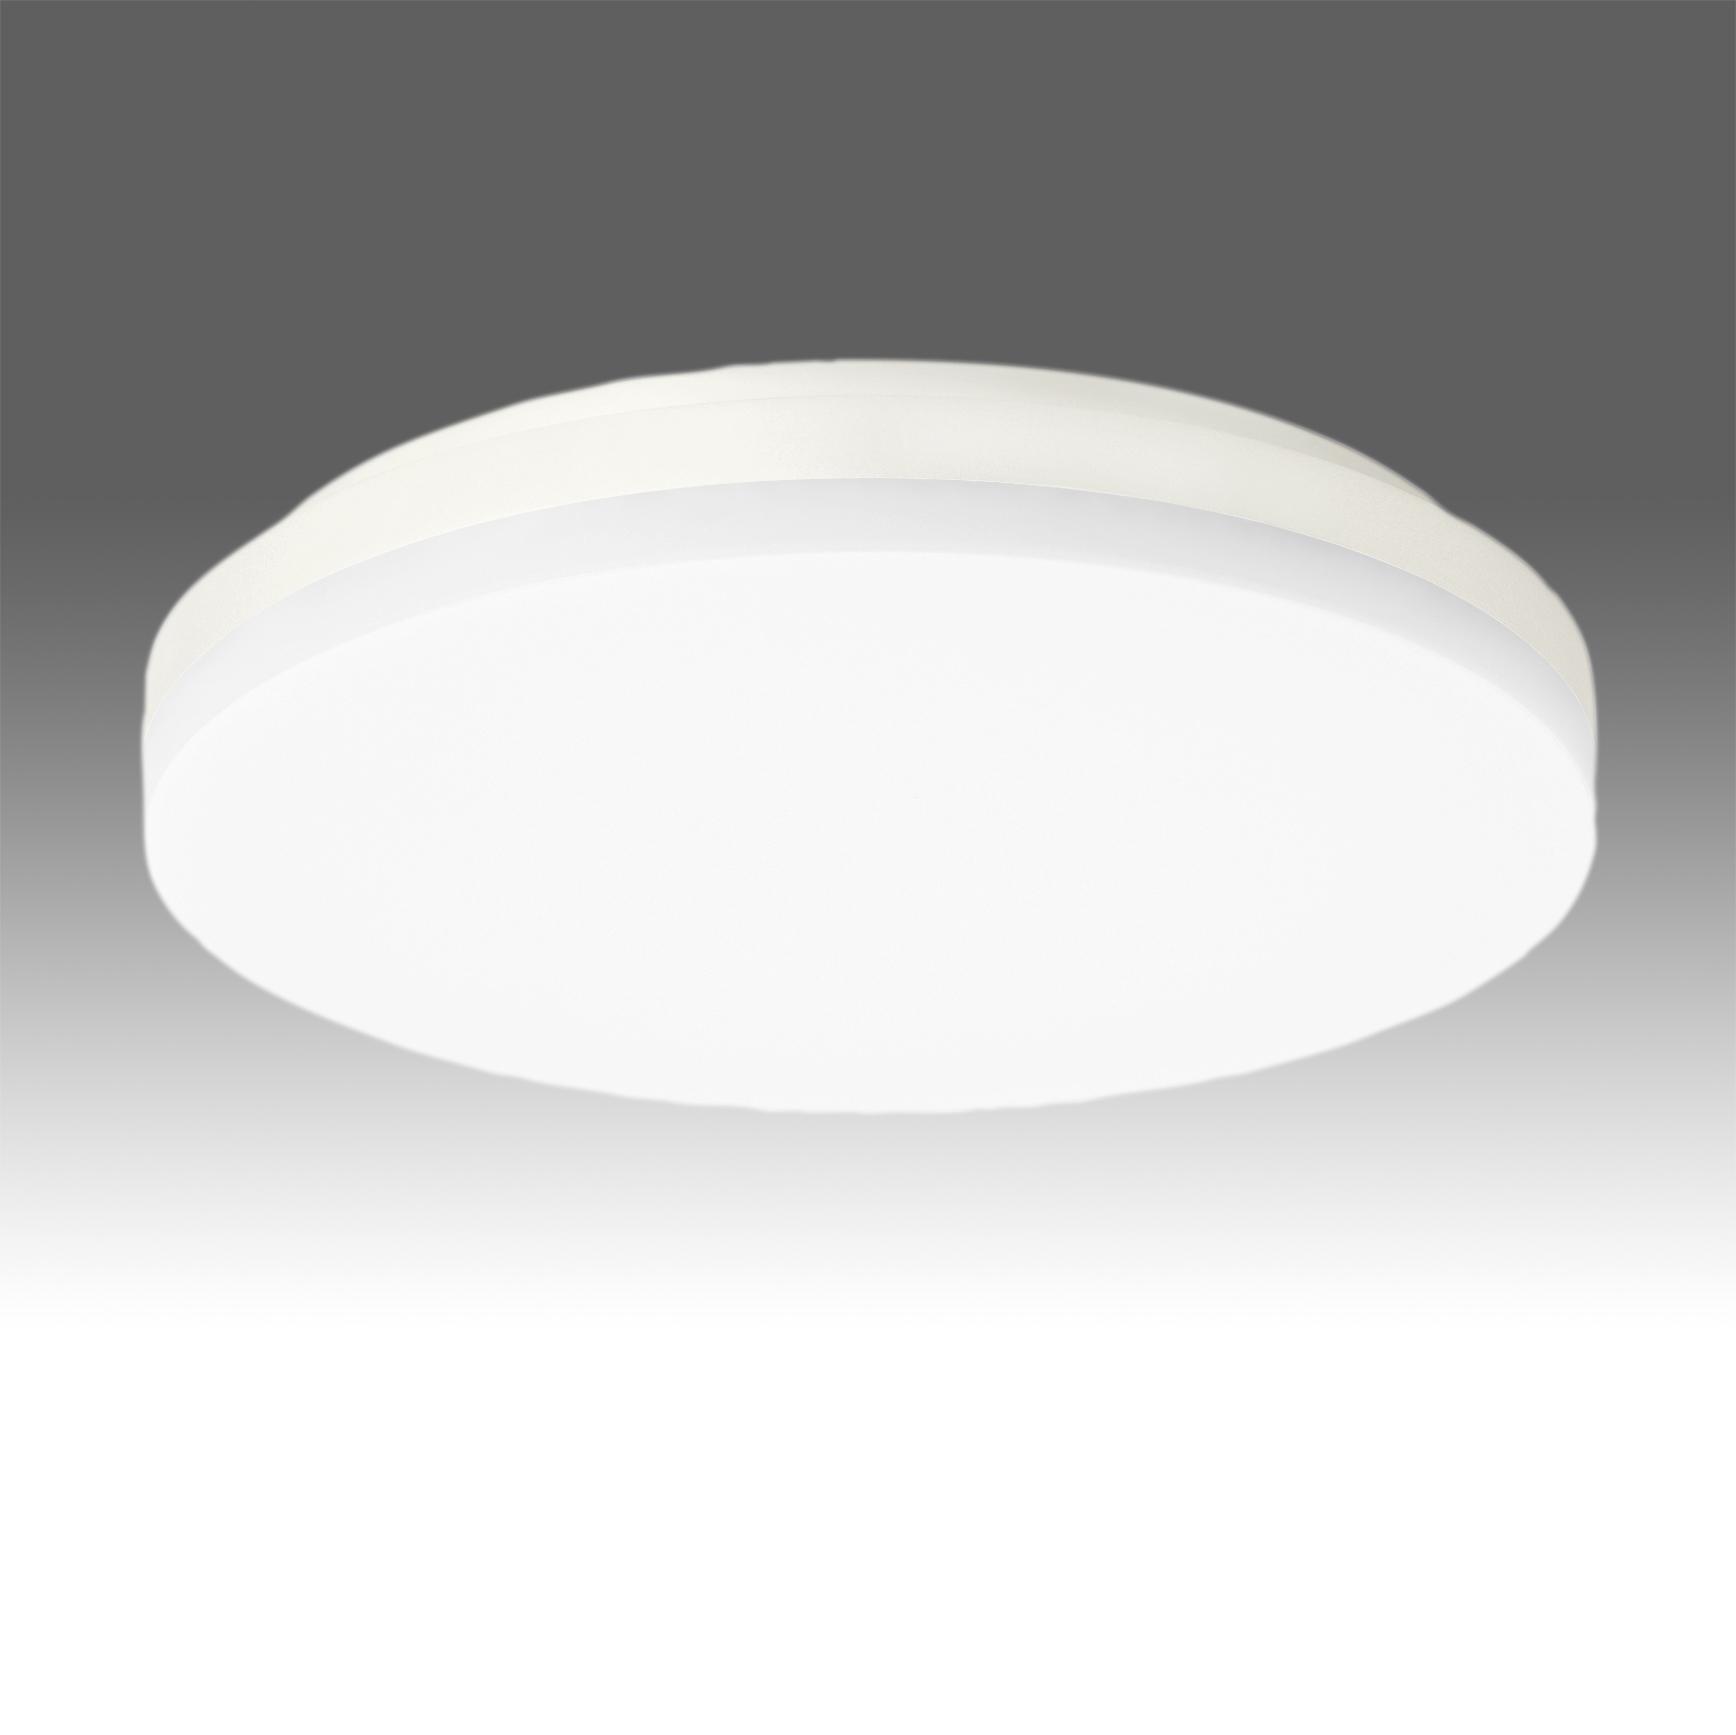 1 Stk Elegance Round III 27W 2800lm 3000K Sensor IP20 weiß LILE0017--